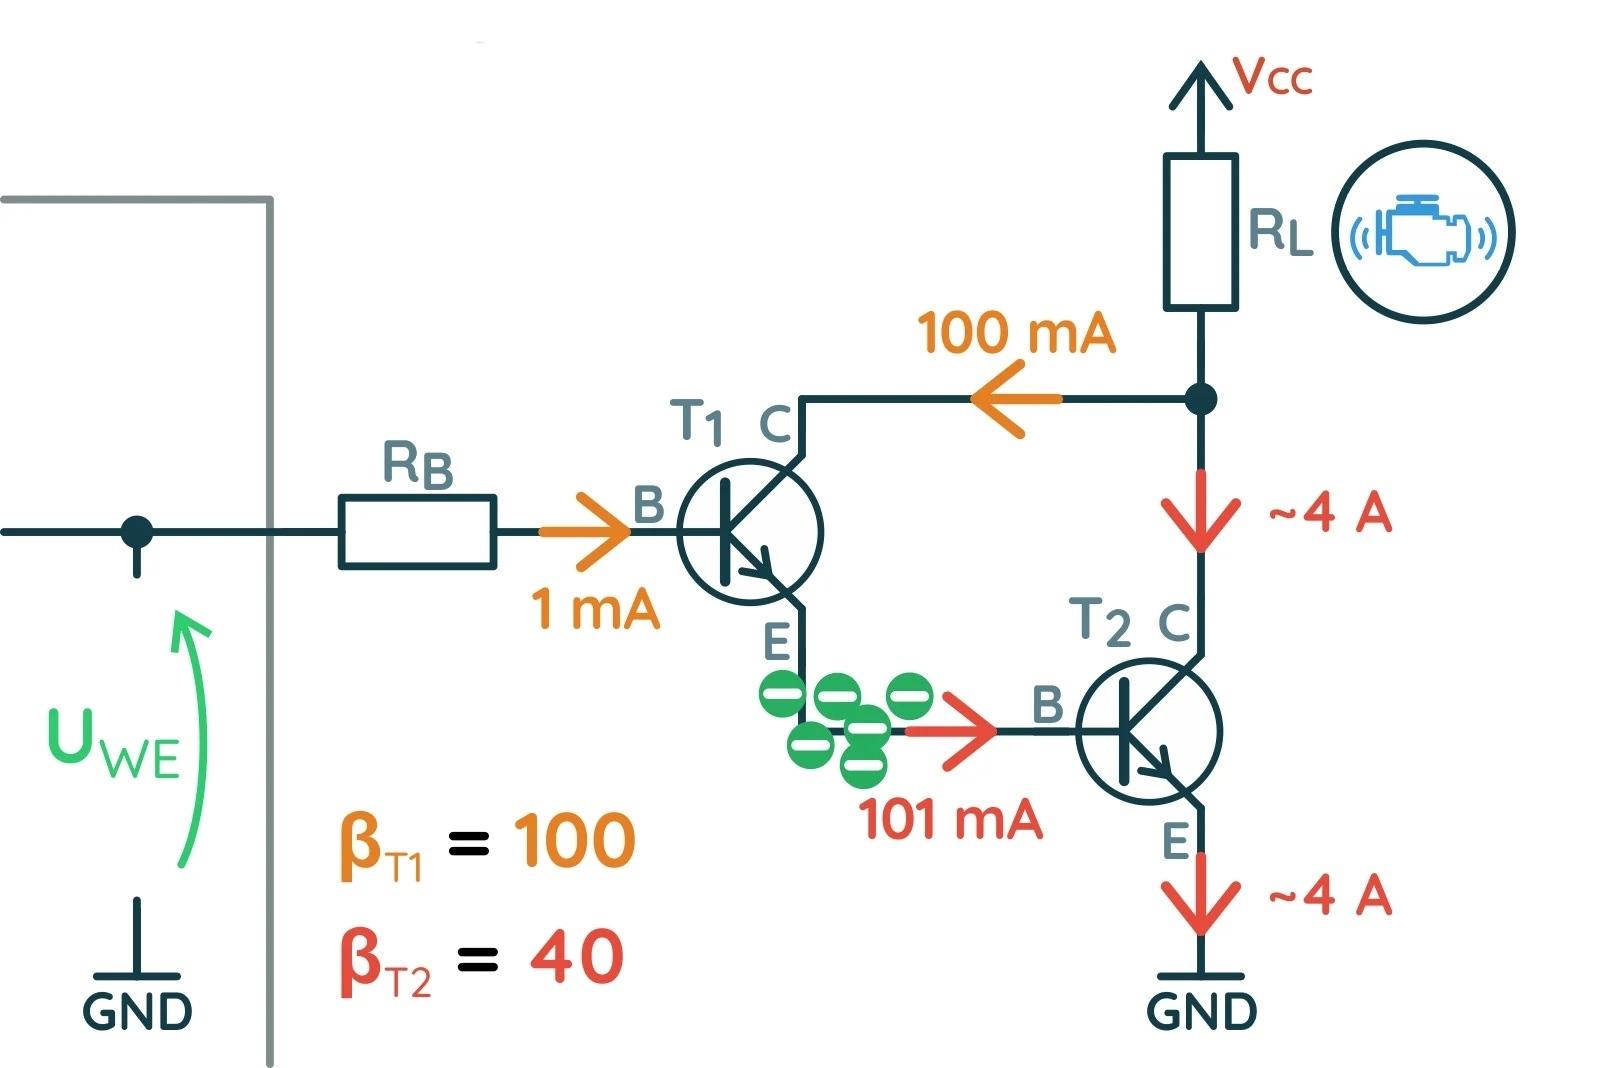 Течение тока через базу, активирует оба транзистора